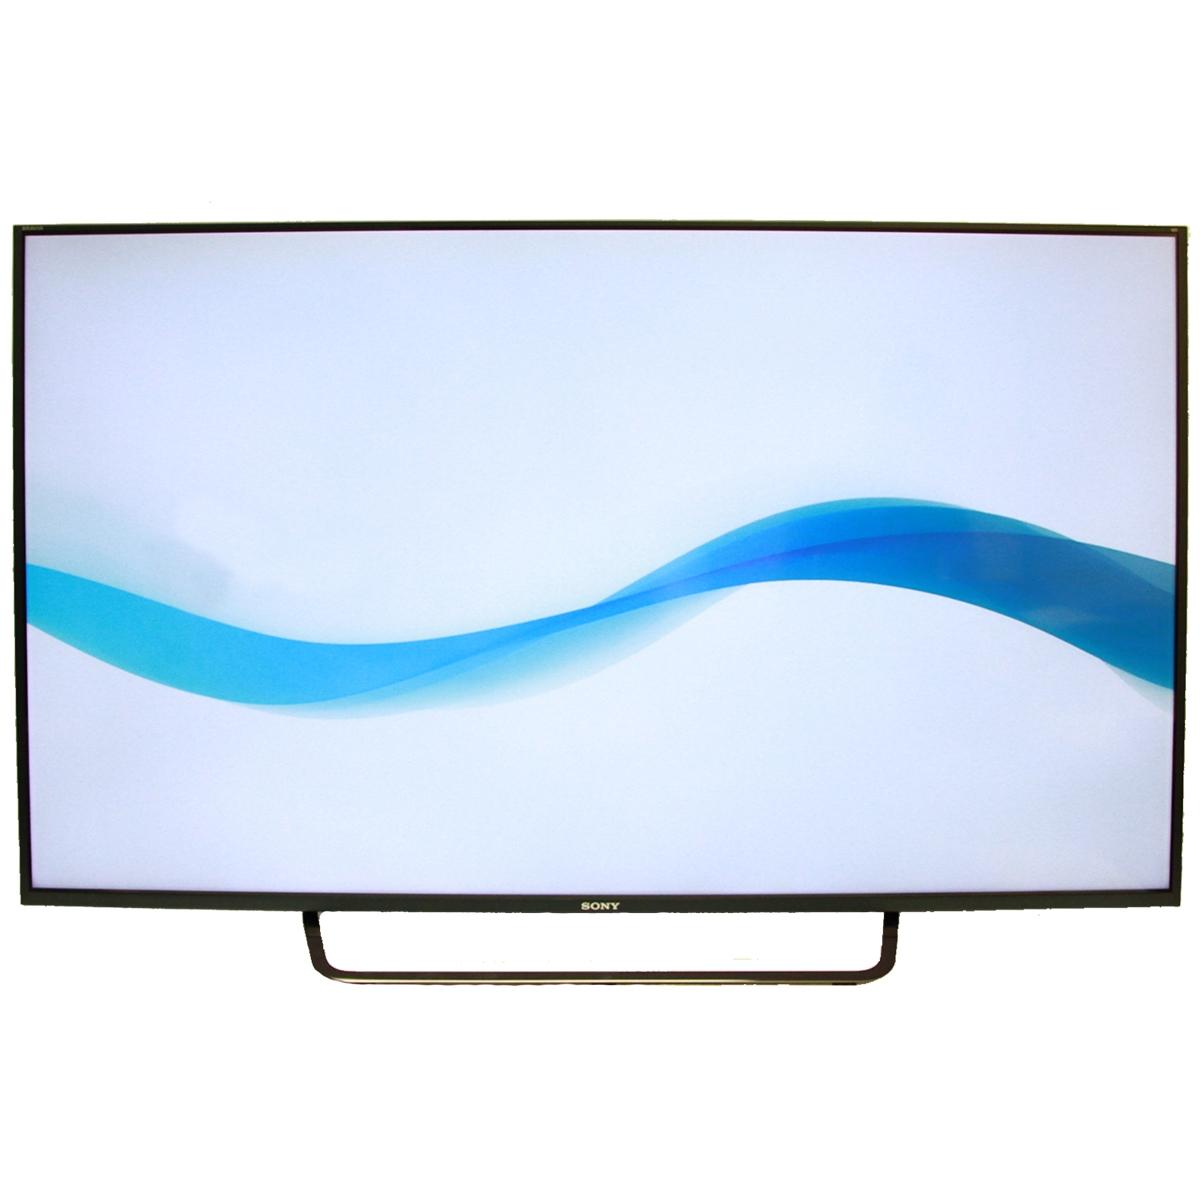 Sony 43inch XBR Series LED 4K Ultra HDTV - XBR-43X830C